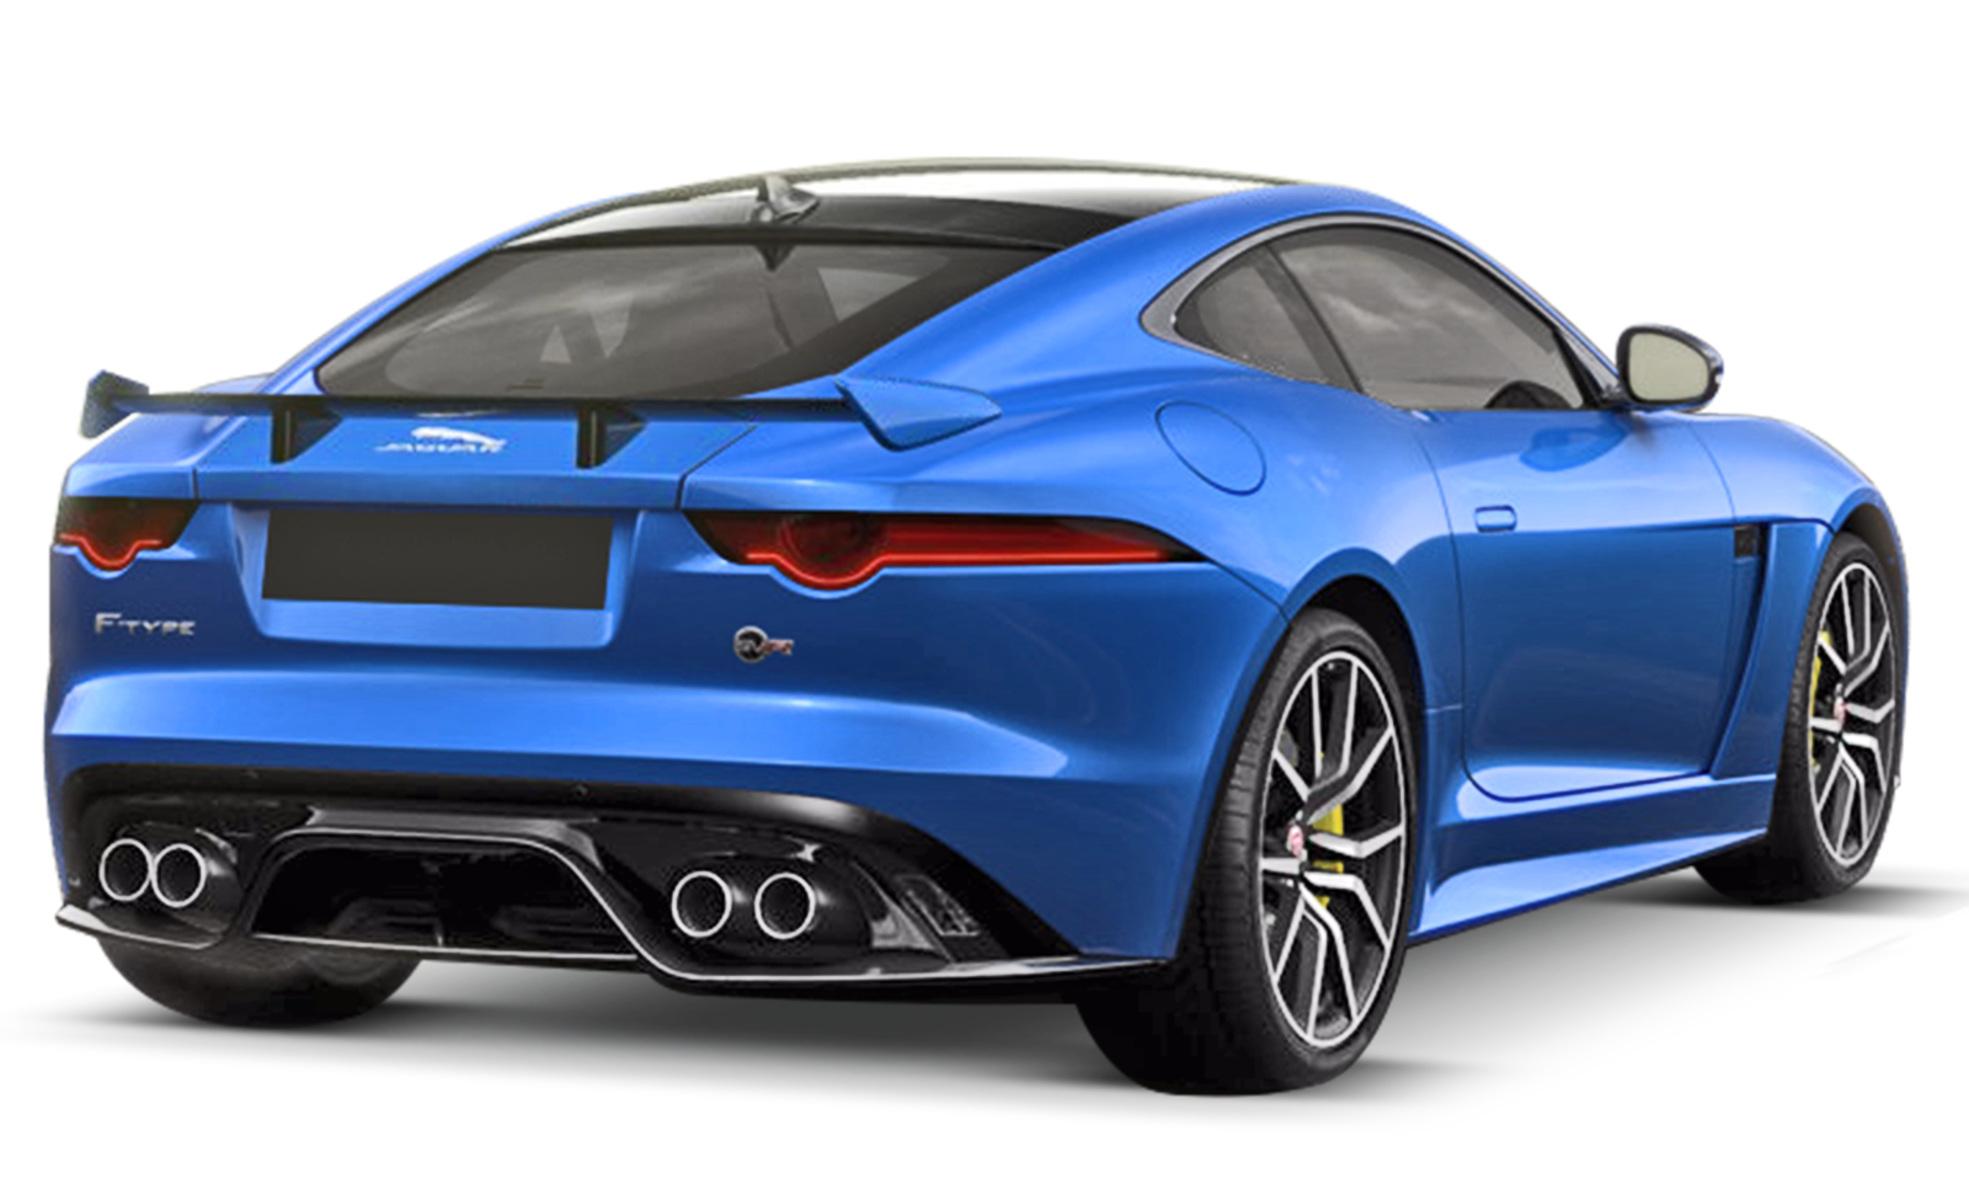 Listino Jaguar F-Type Coupé prezzo - scheda tecnica ...